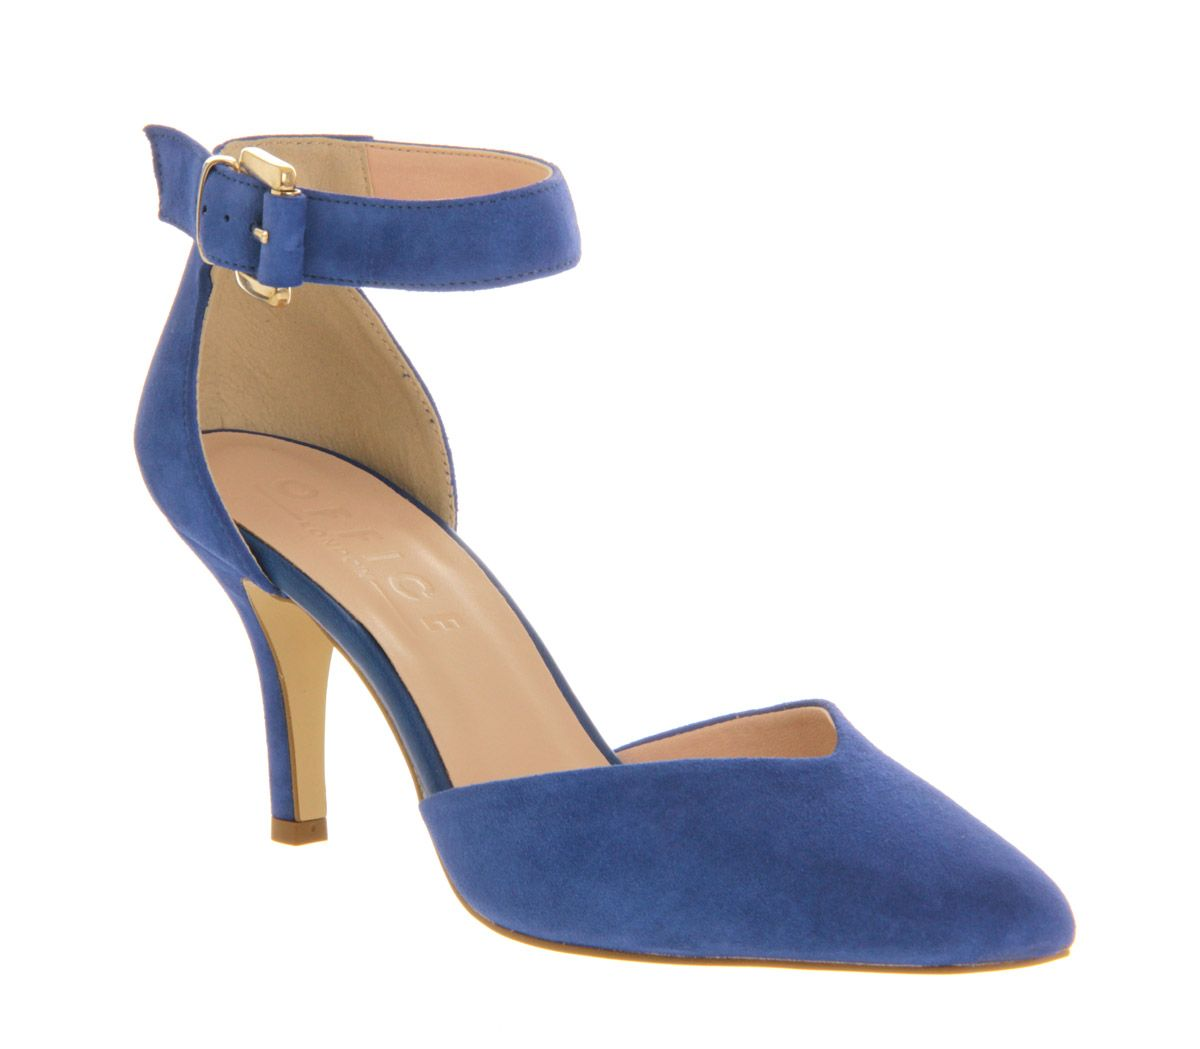 Jessica Simpson Waleo | Heels, Fabulous shoes, Women shoes